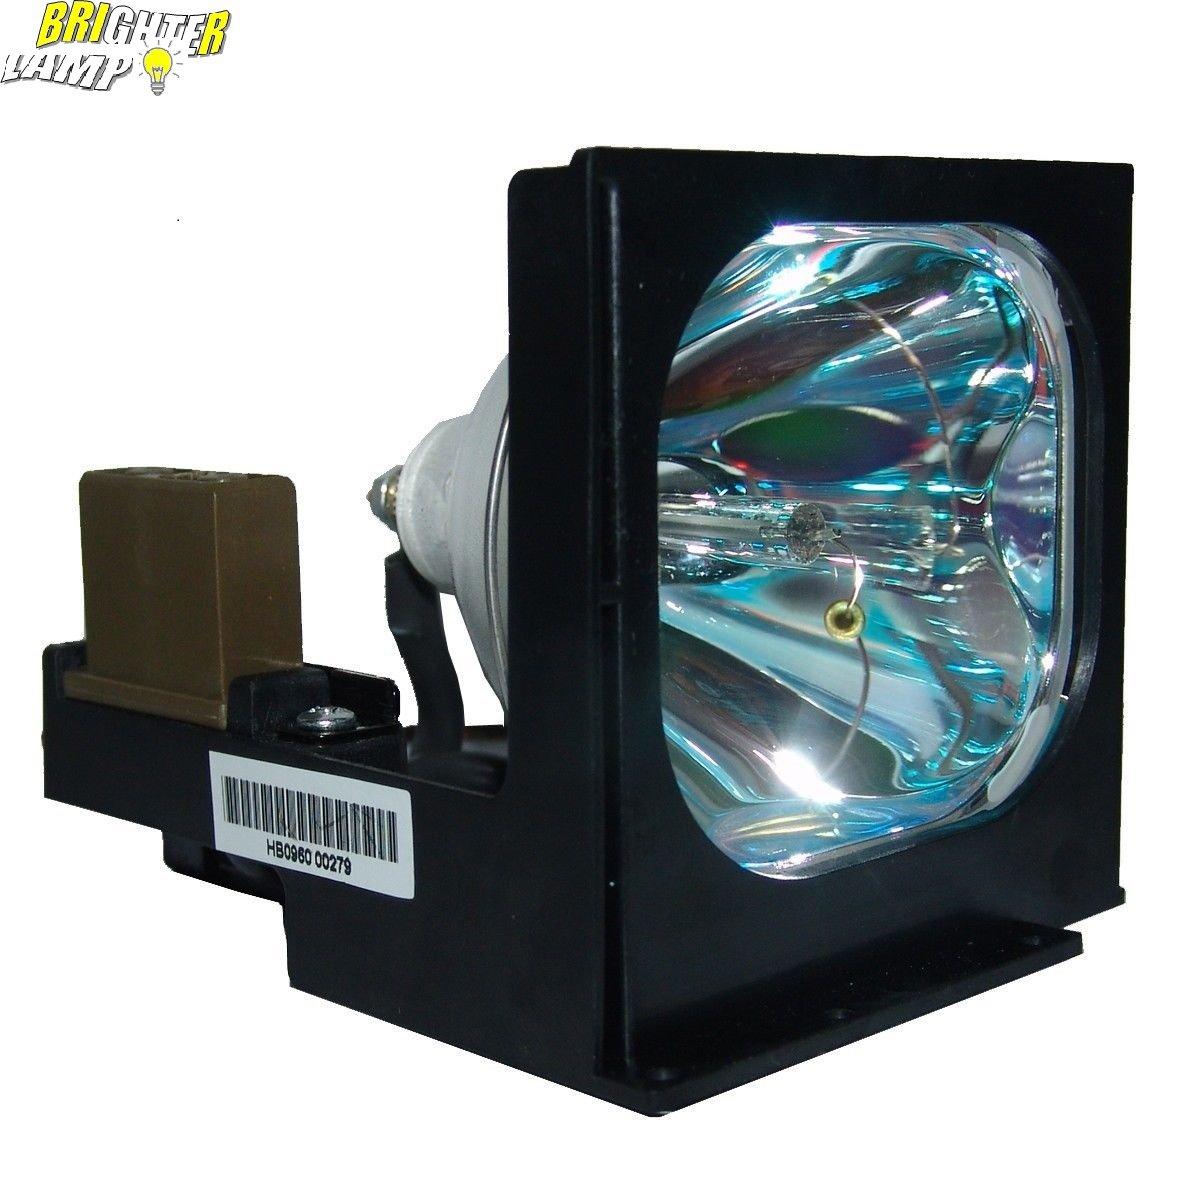 Brighter Lamp POA-LMP19 プロジェクターランプ for サンヨウ Sanyo PLC-XU07 バルブ採用/高輝度/長寿命   B07FSJN47Y